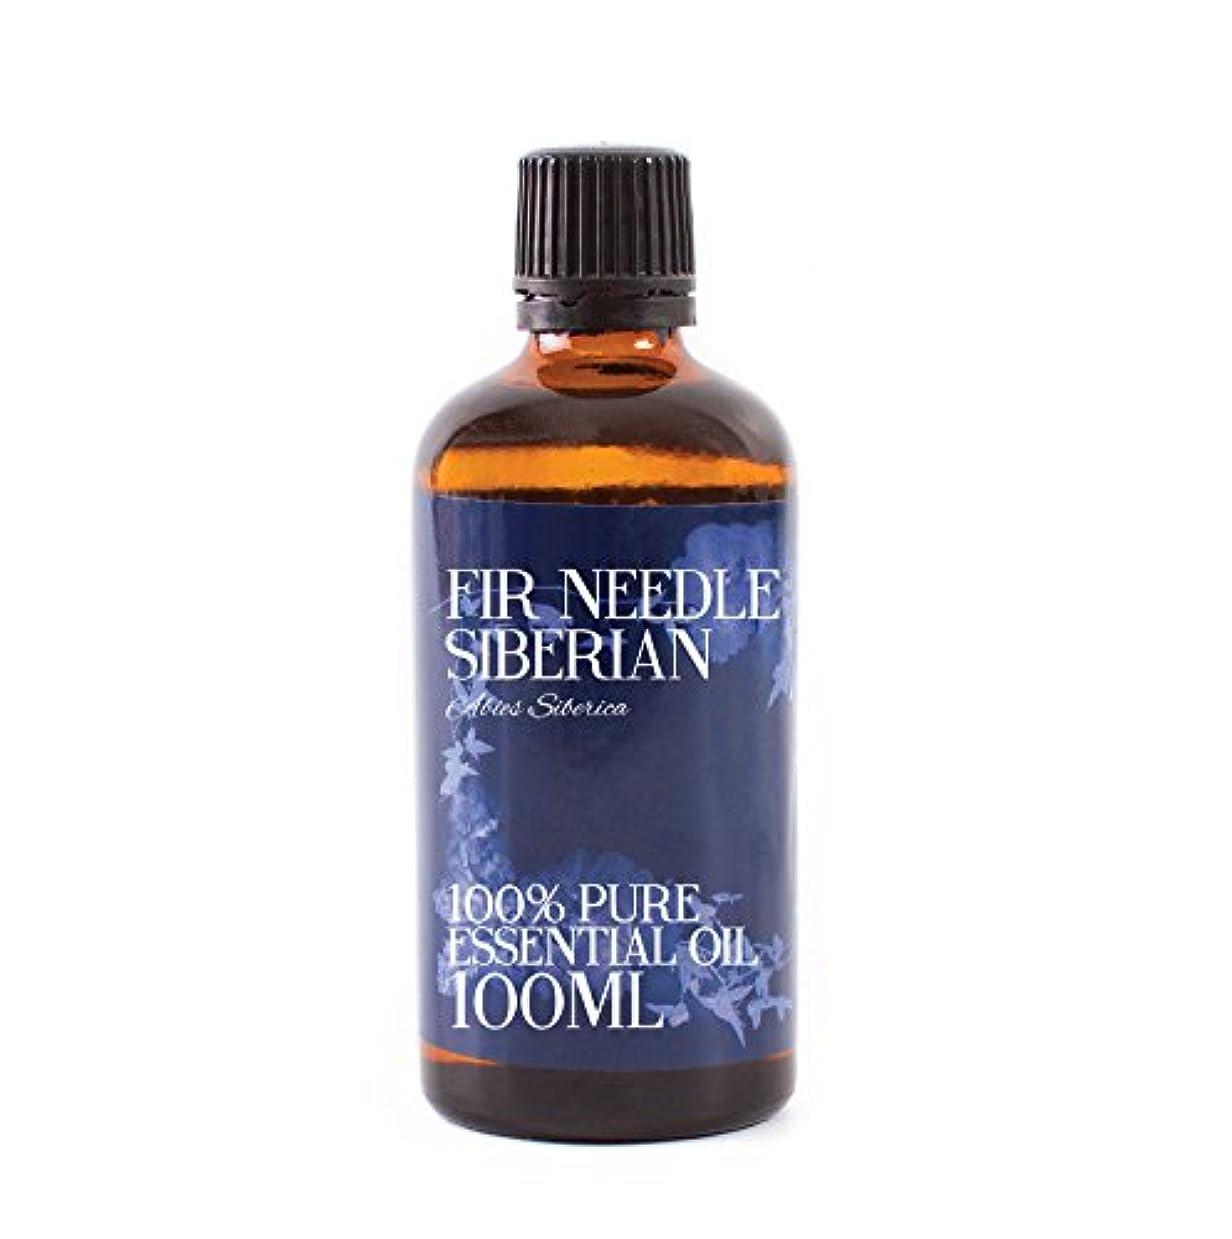 Mystic Moments | Fir Needle Siberian Essential Oil - 100ml - 100% Pure